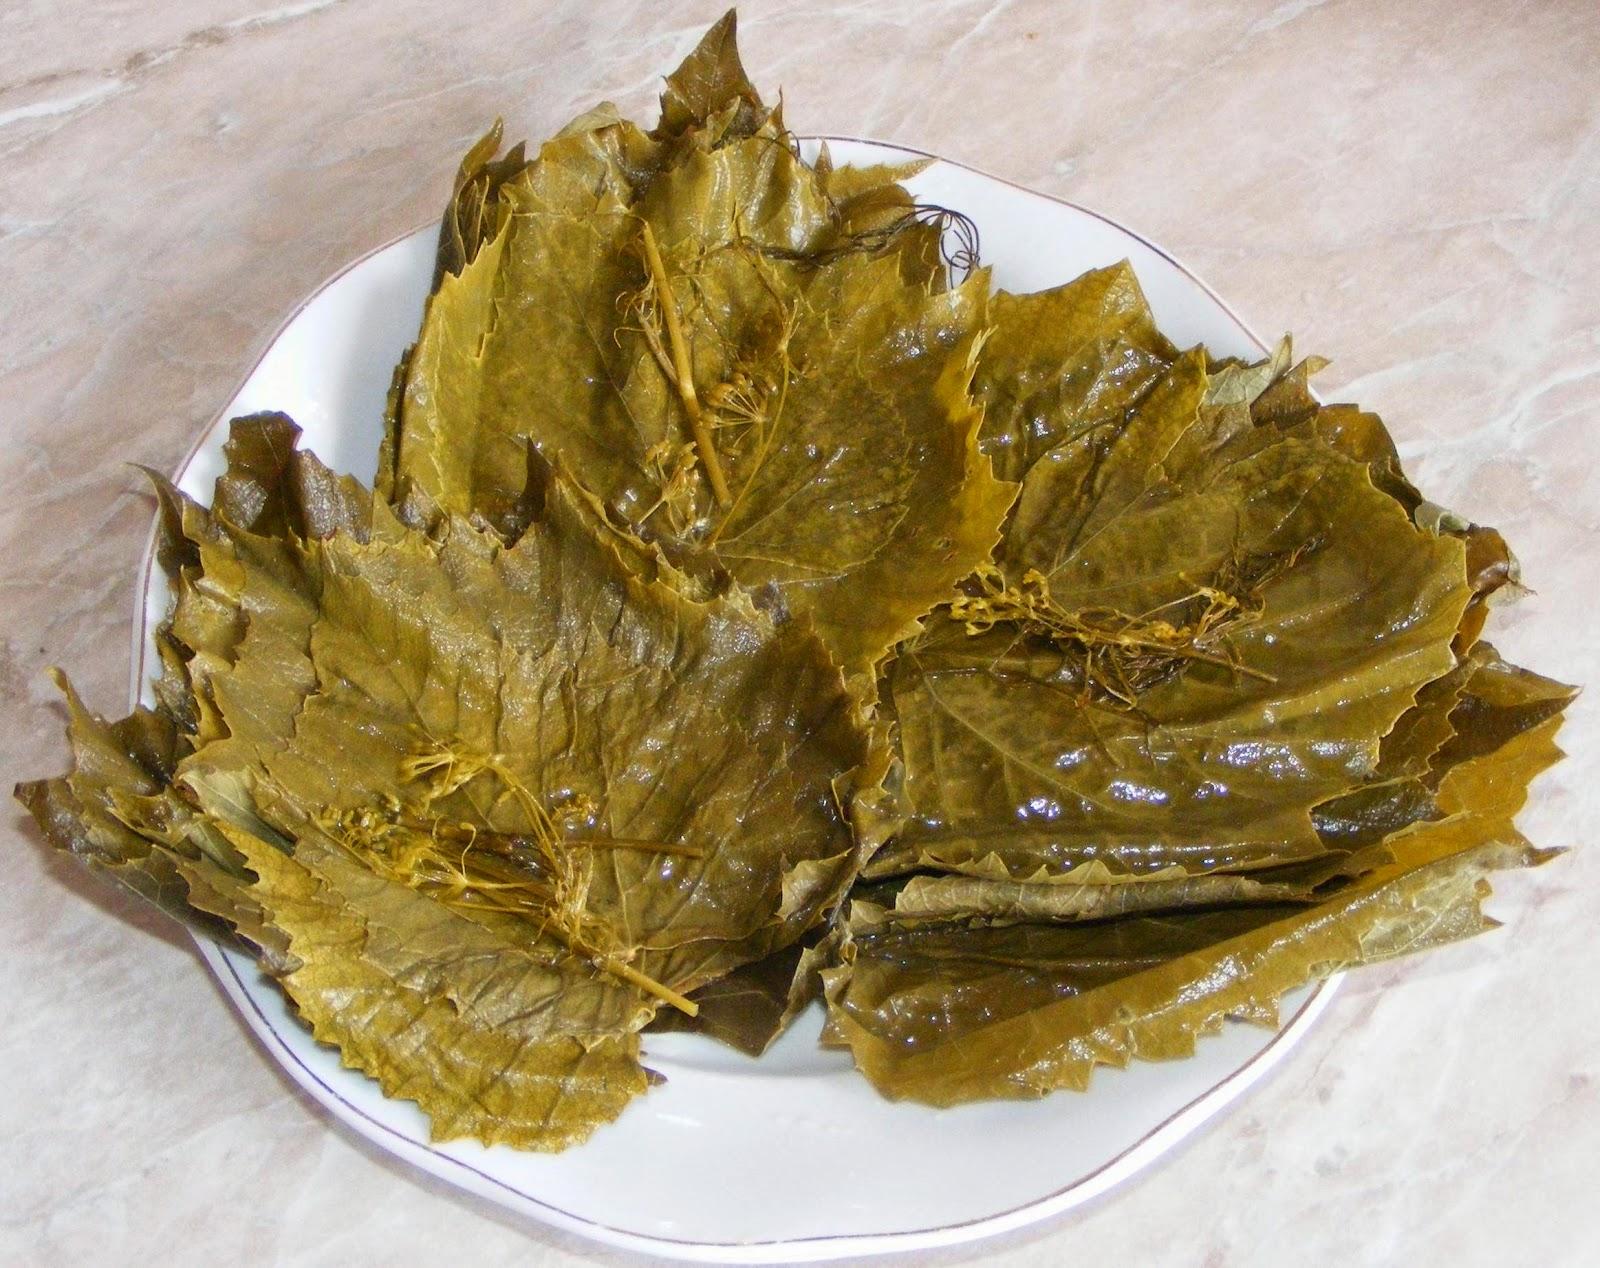 Frunza de vie murata pentru iarna retete culinare,